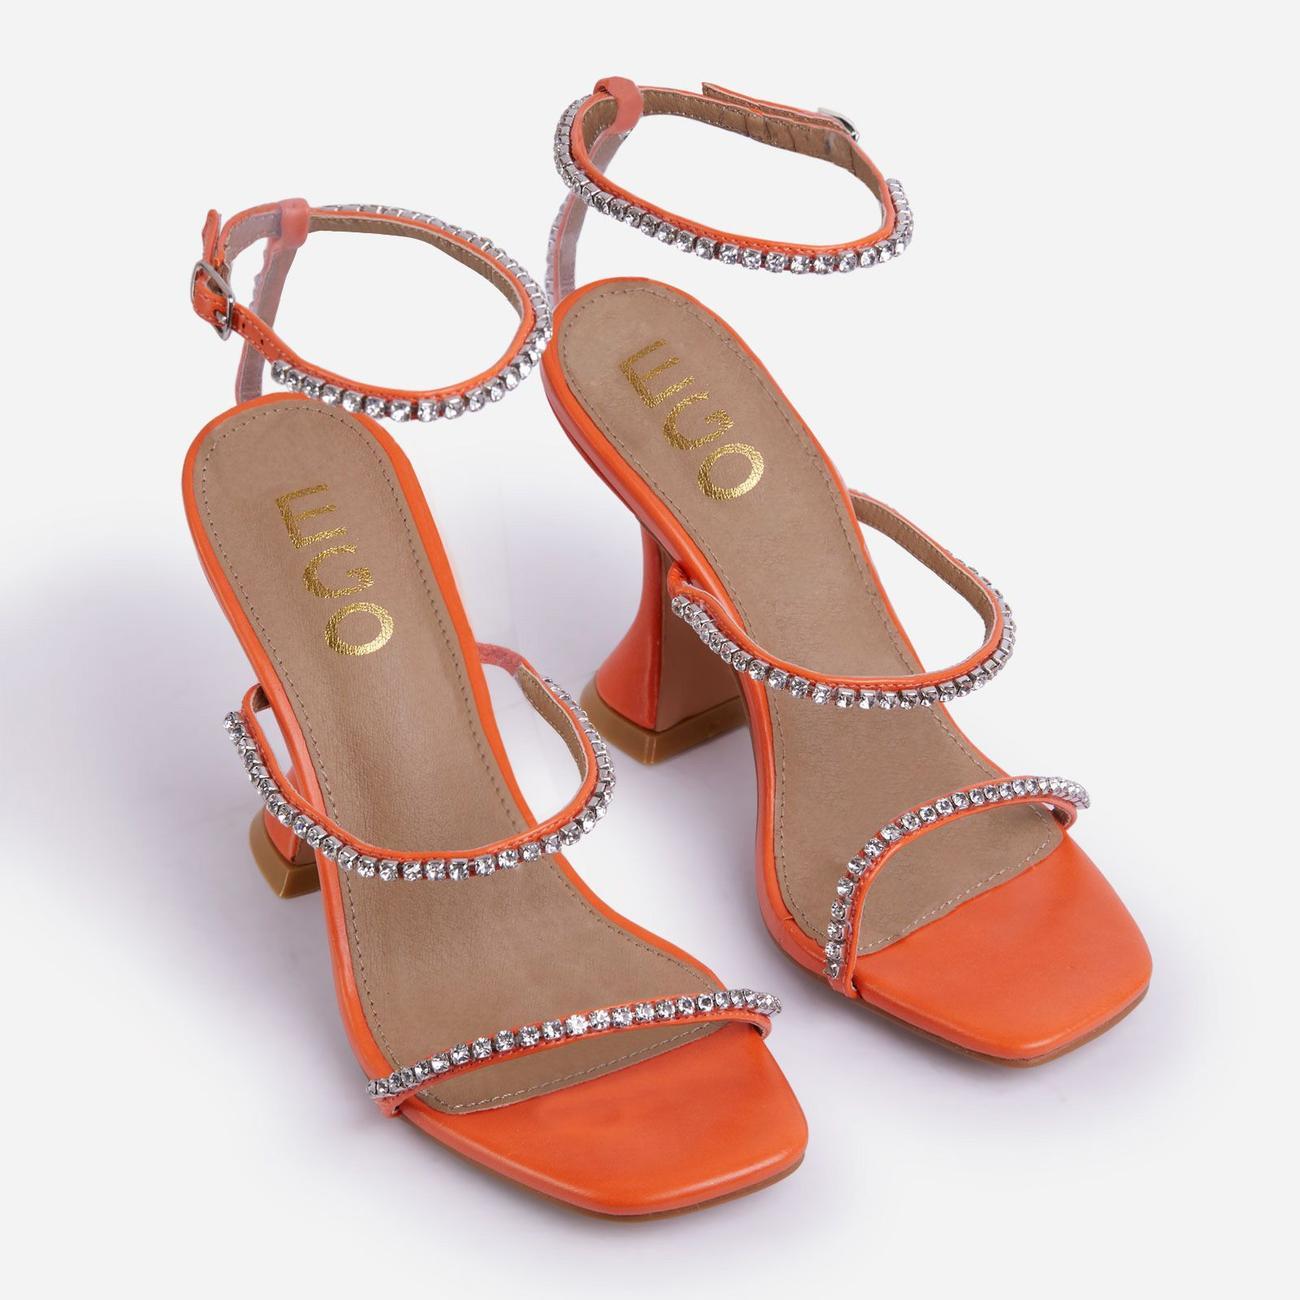 Catch Me Diamante Detail Square Toe Pyramid Heel In Orange Faux Leather Image 2